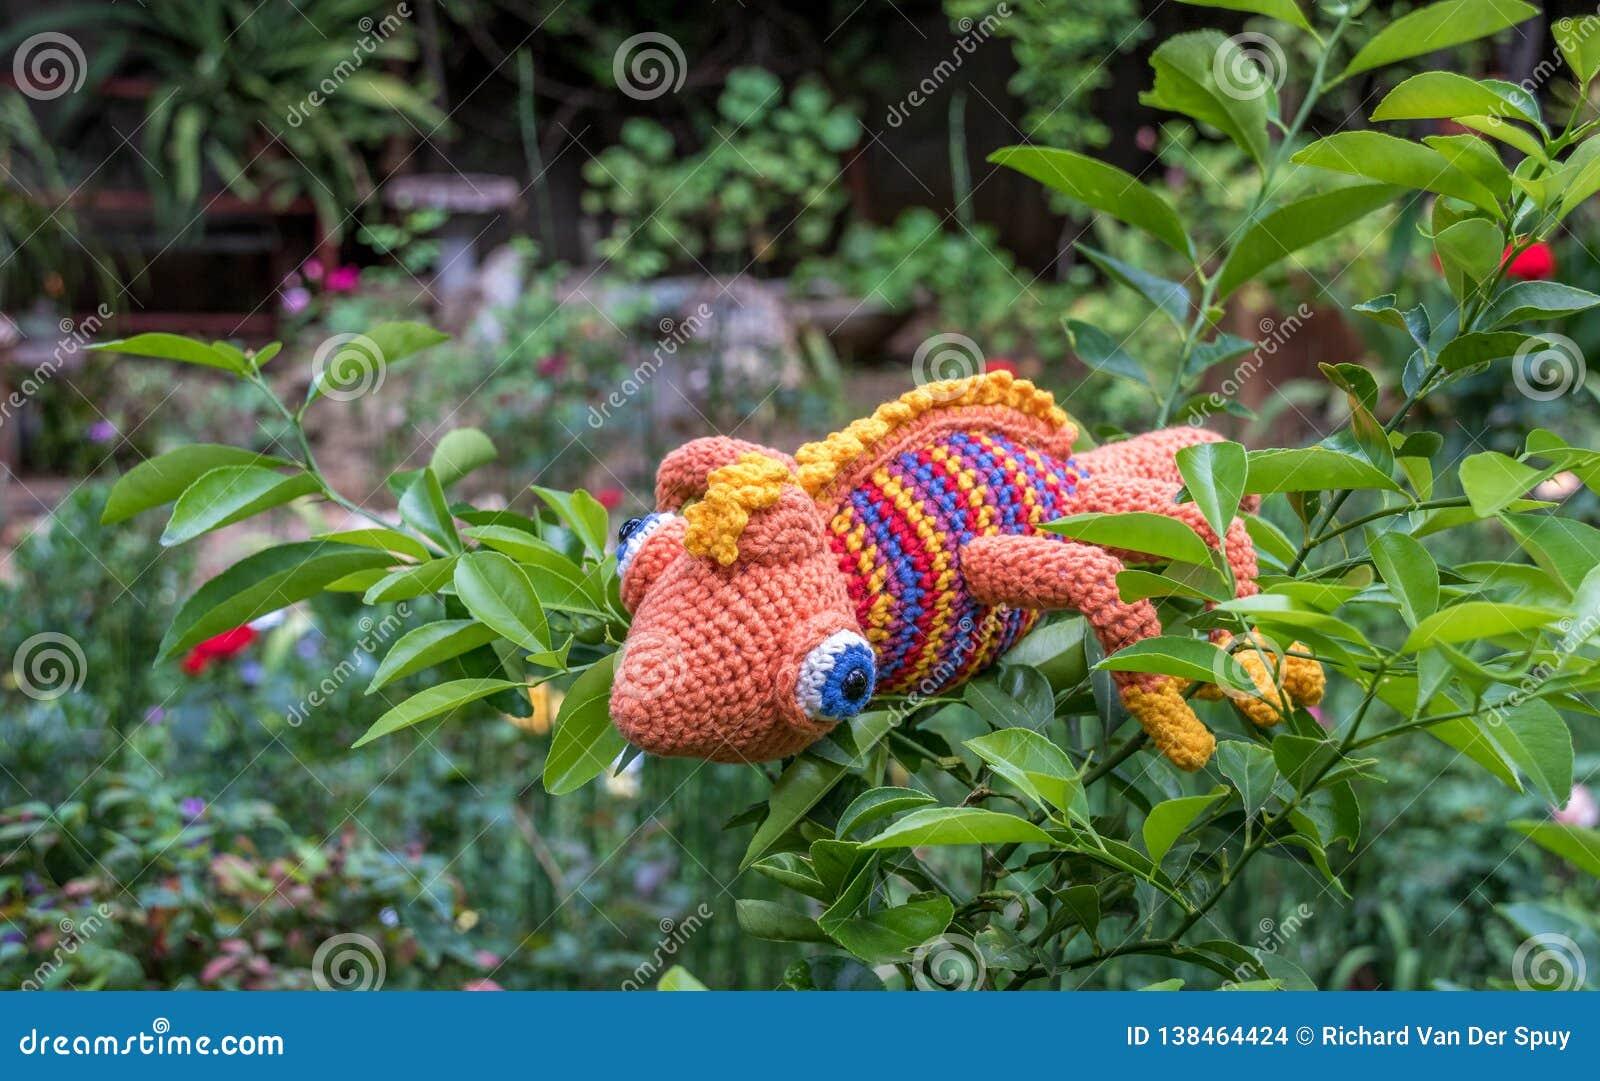 Fake chameleon on a green bush